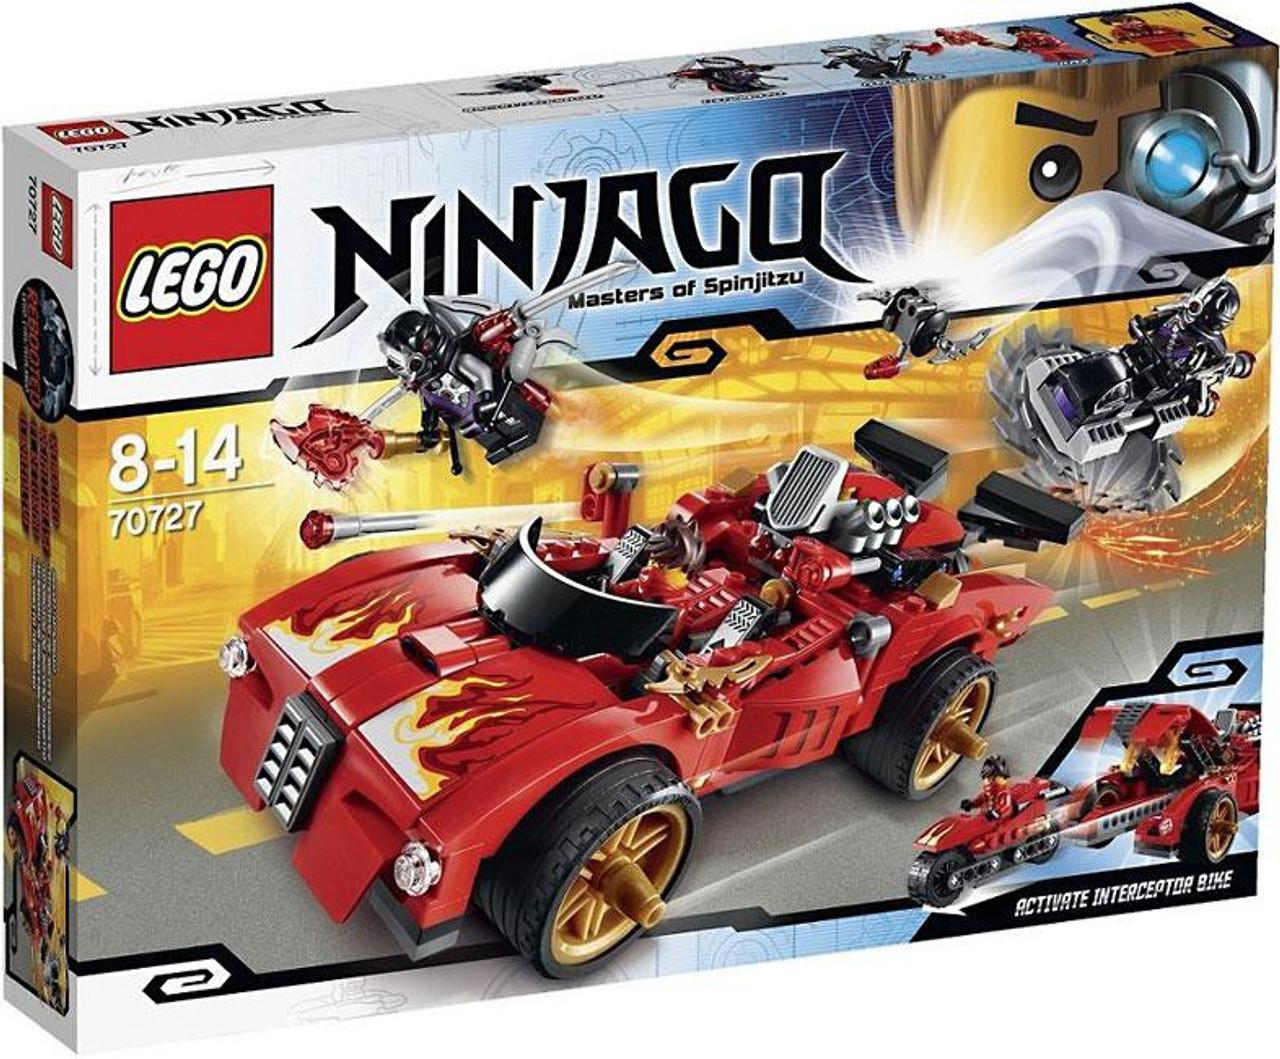 LEGO Ninjago Rebooted X-1 Ninja Charger Set #70727